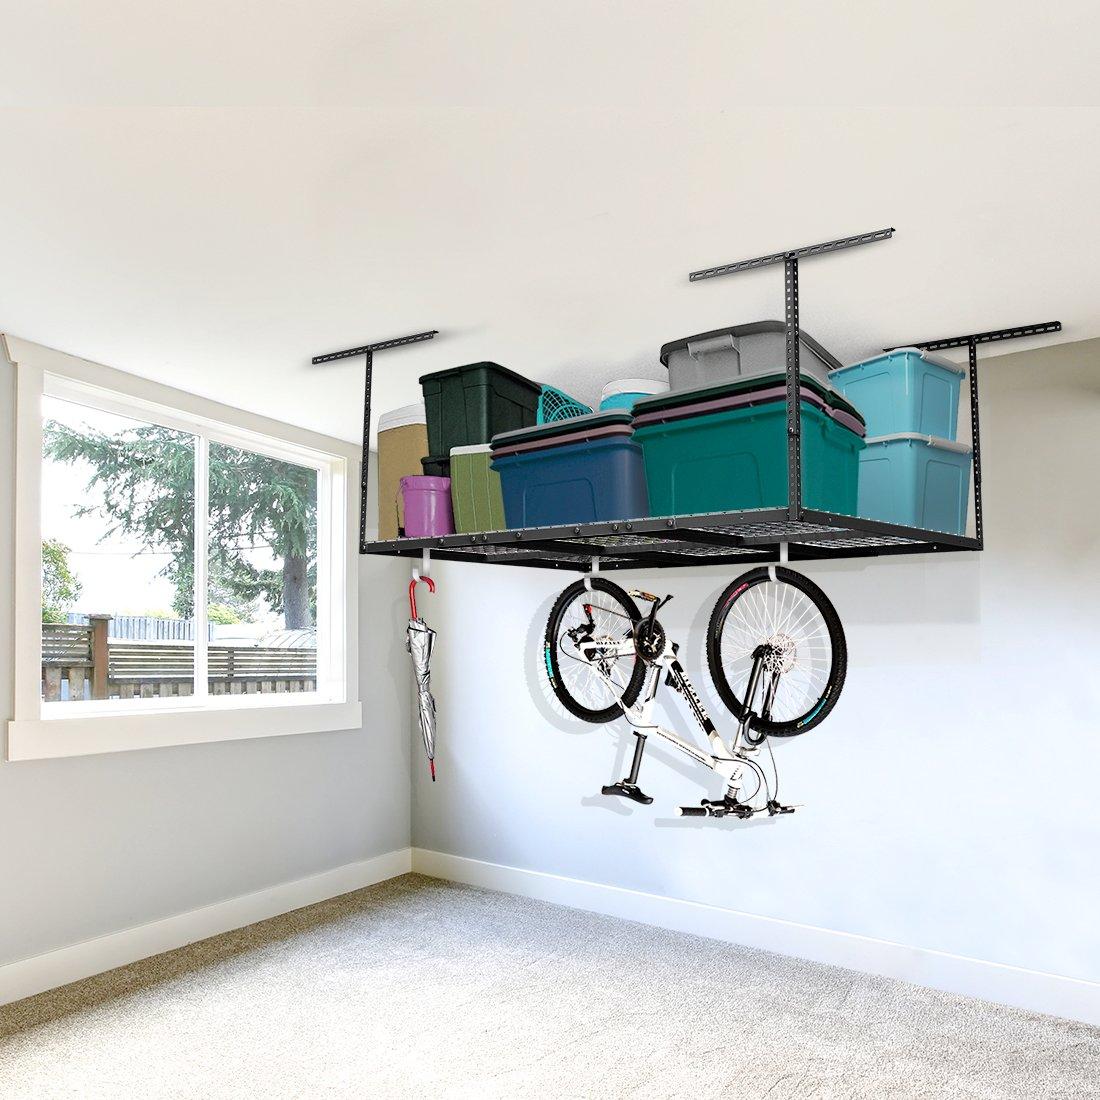 FLEXIMOUNTS 4x6 Heavy Duty Overhead Garage Adjustable Ceiling Storage Rack, 72'' Length x 48'' Width x 40'' Height, Black by FLEXIMOUNTS (Image #1)